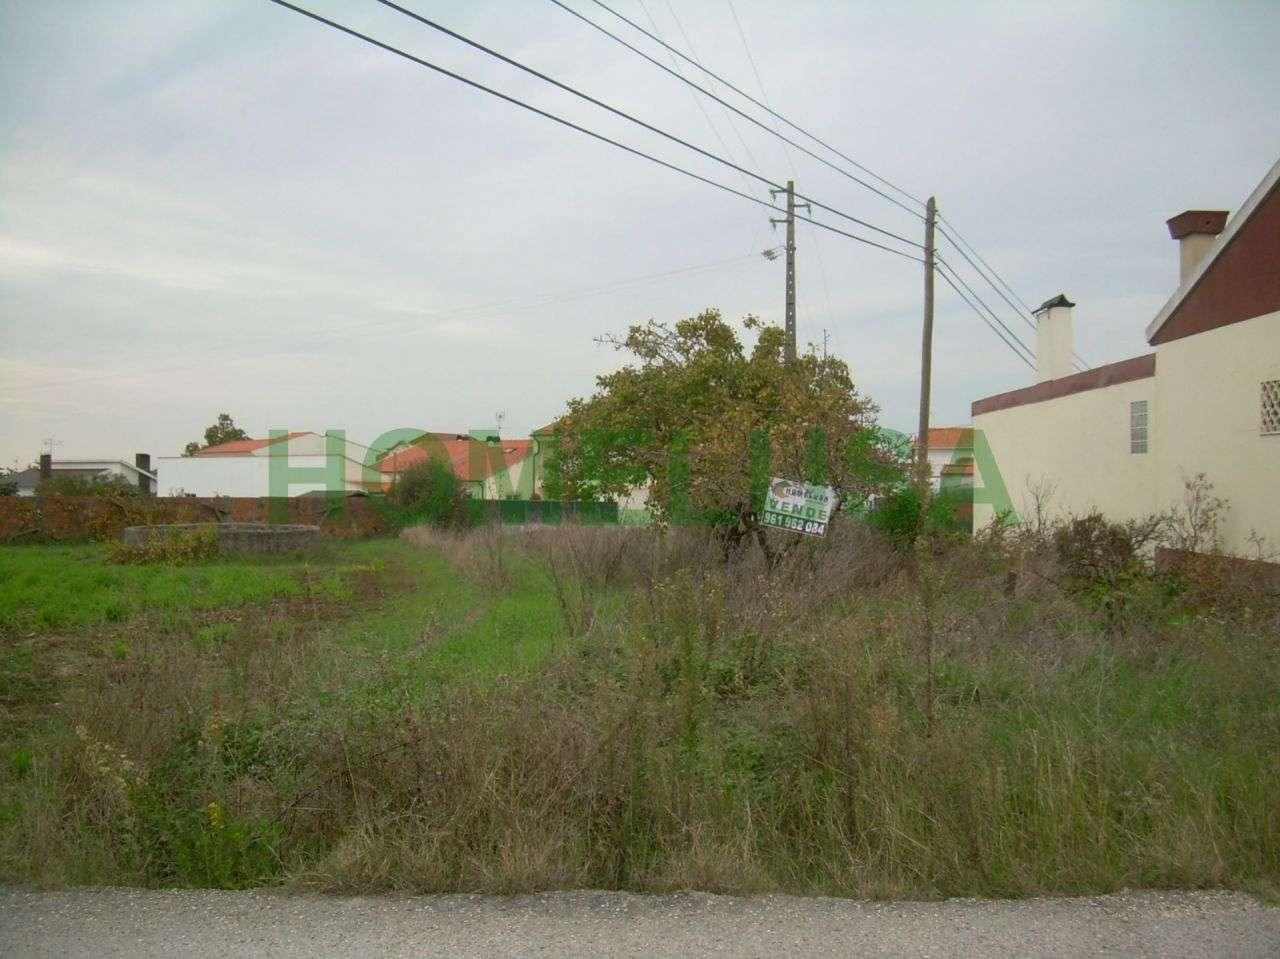 Terreno para comprar, Lavos, Coimbra - Foto 11